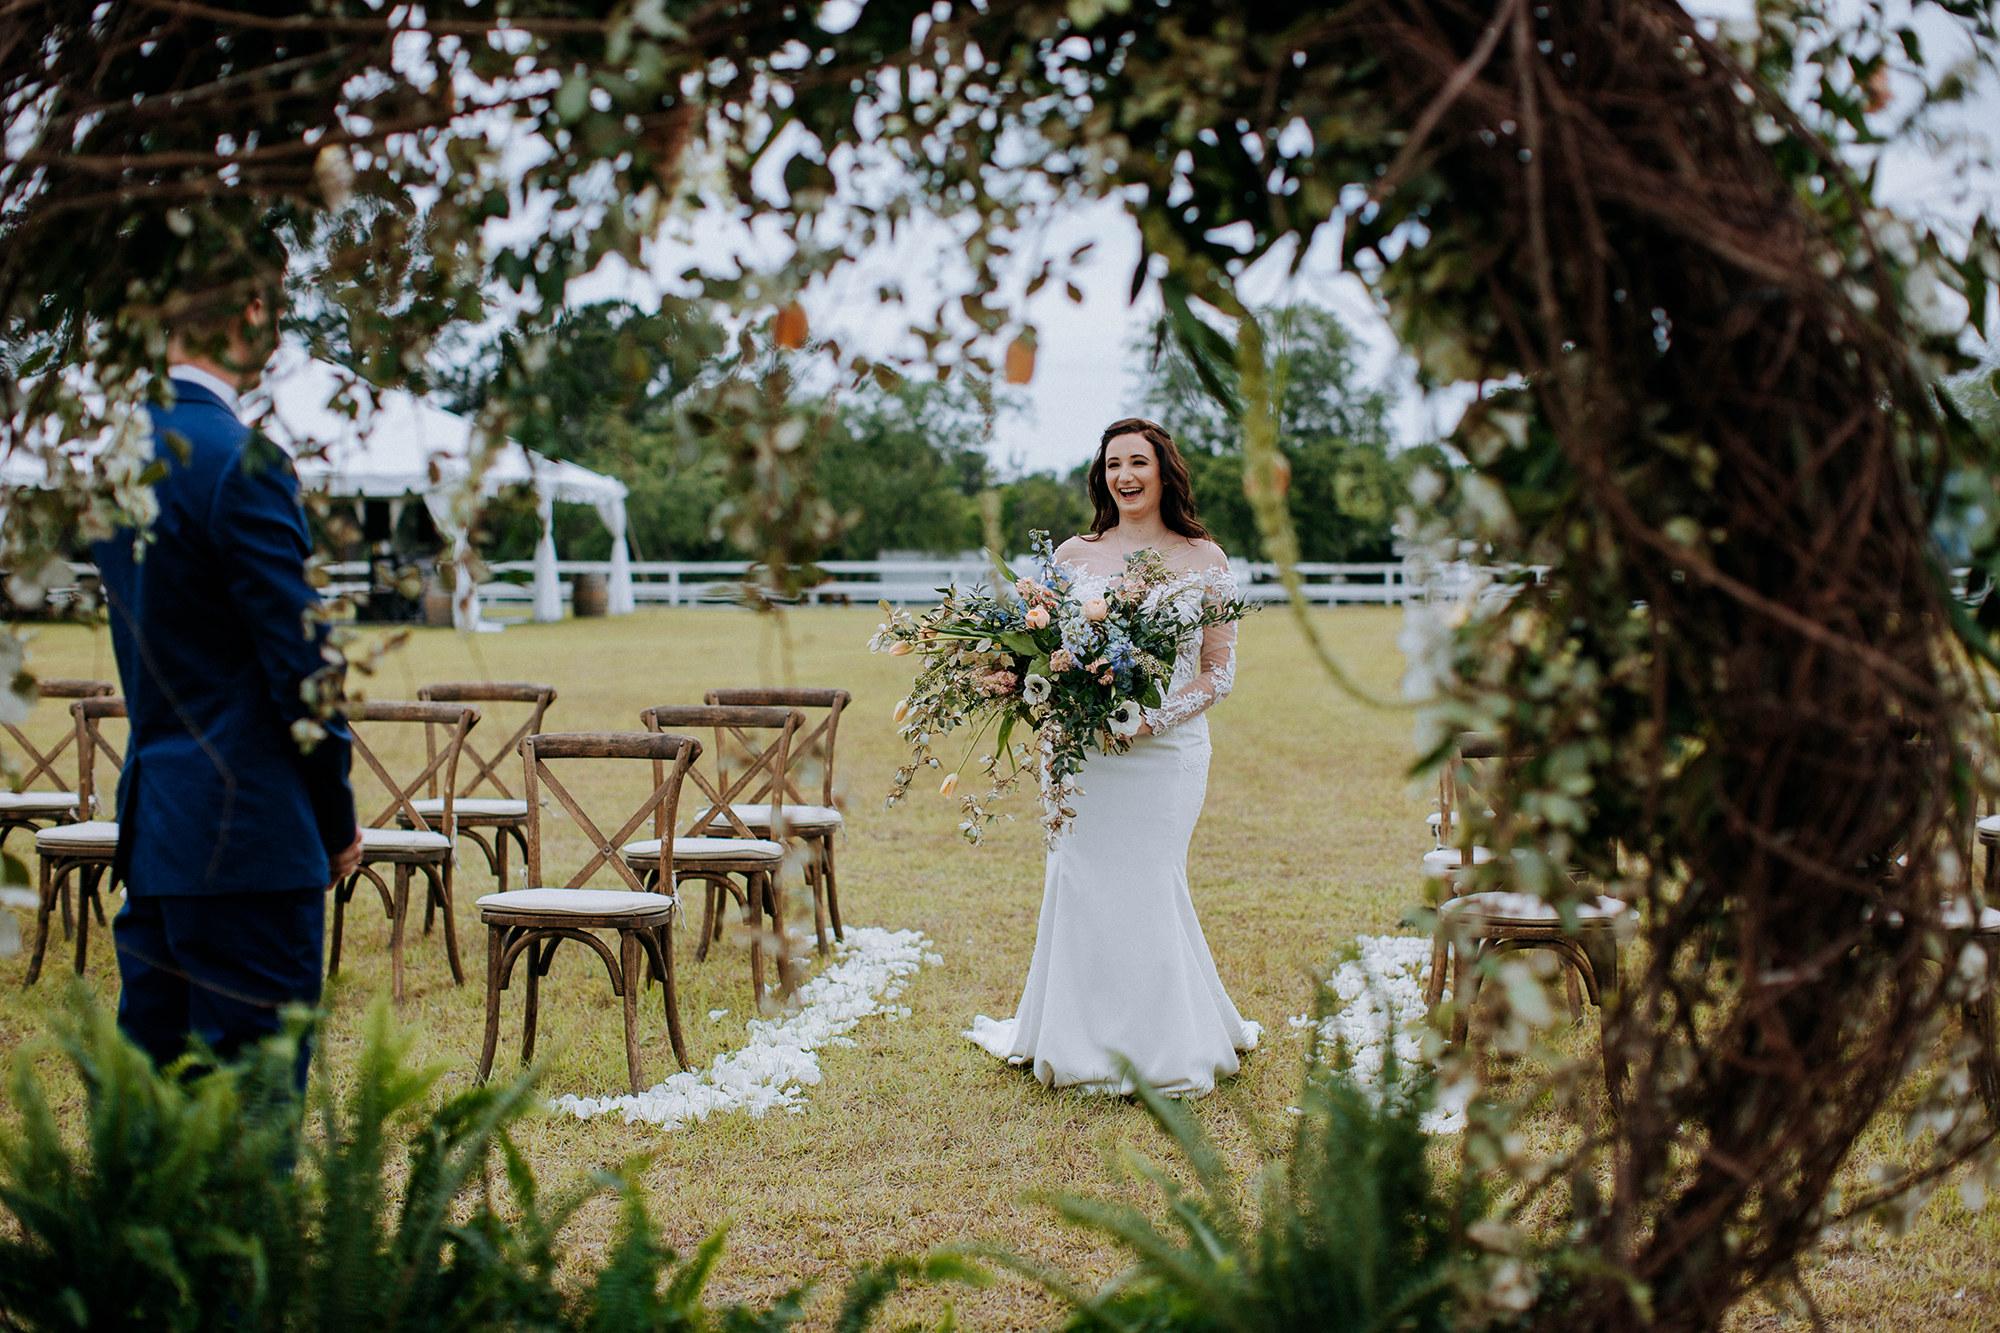 classic-southern-wedding-ivory-and-beau-styled-shoot-classic-southern-wedding-inspiration-georiga-wedding-savannah-wedding-planner-savannah-florist-savannah-bridal-shop-wedding-inspiration-pastel-wedding-inspiration-savanah-wedding-inspiration